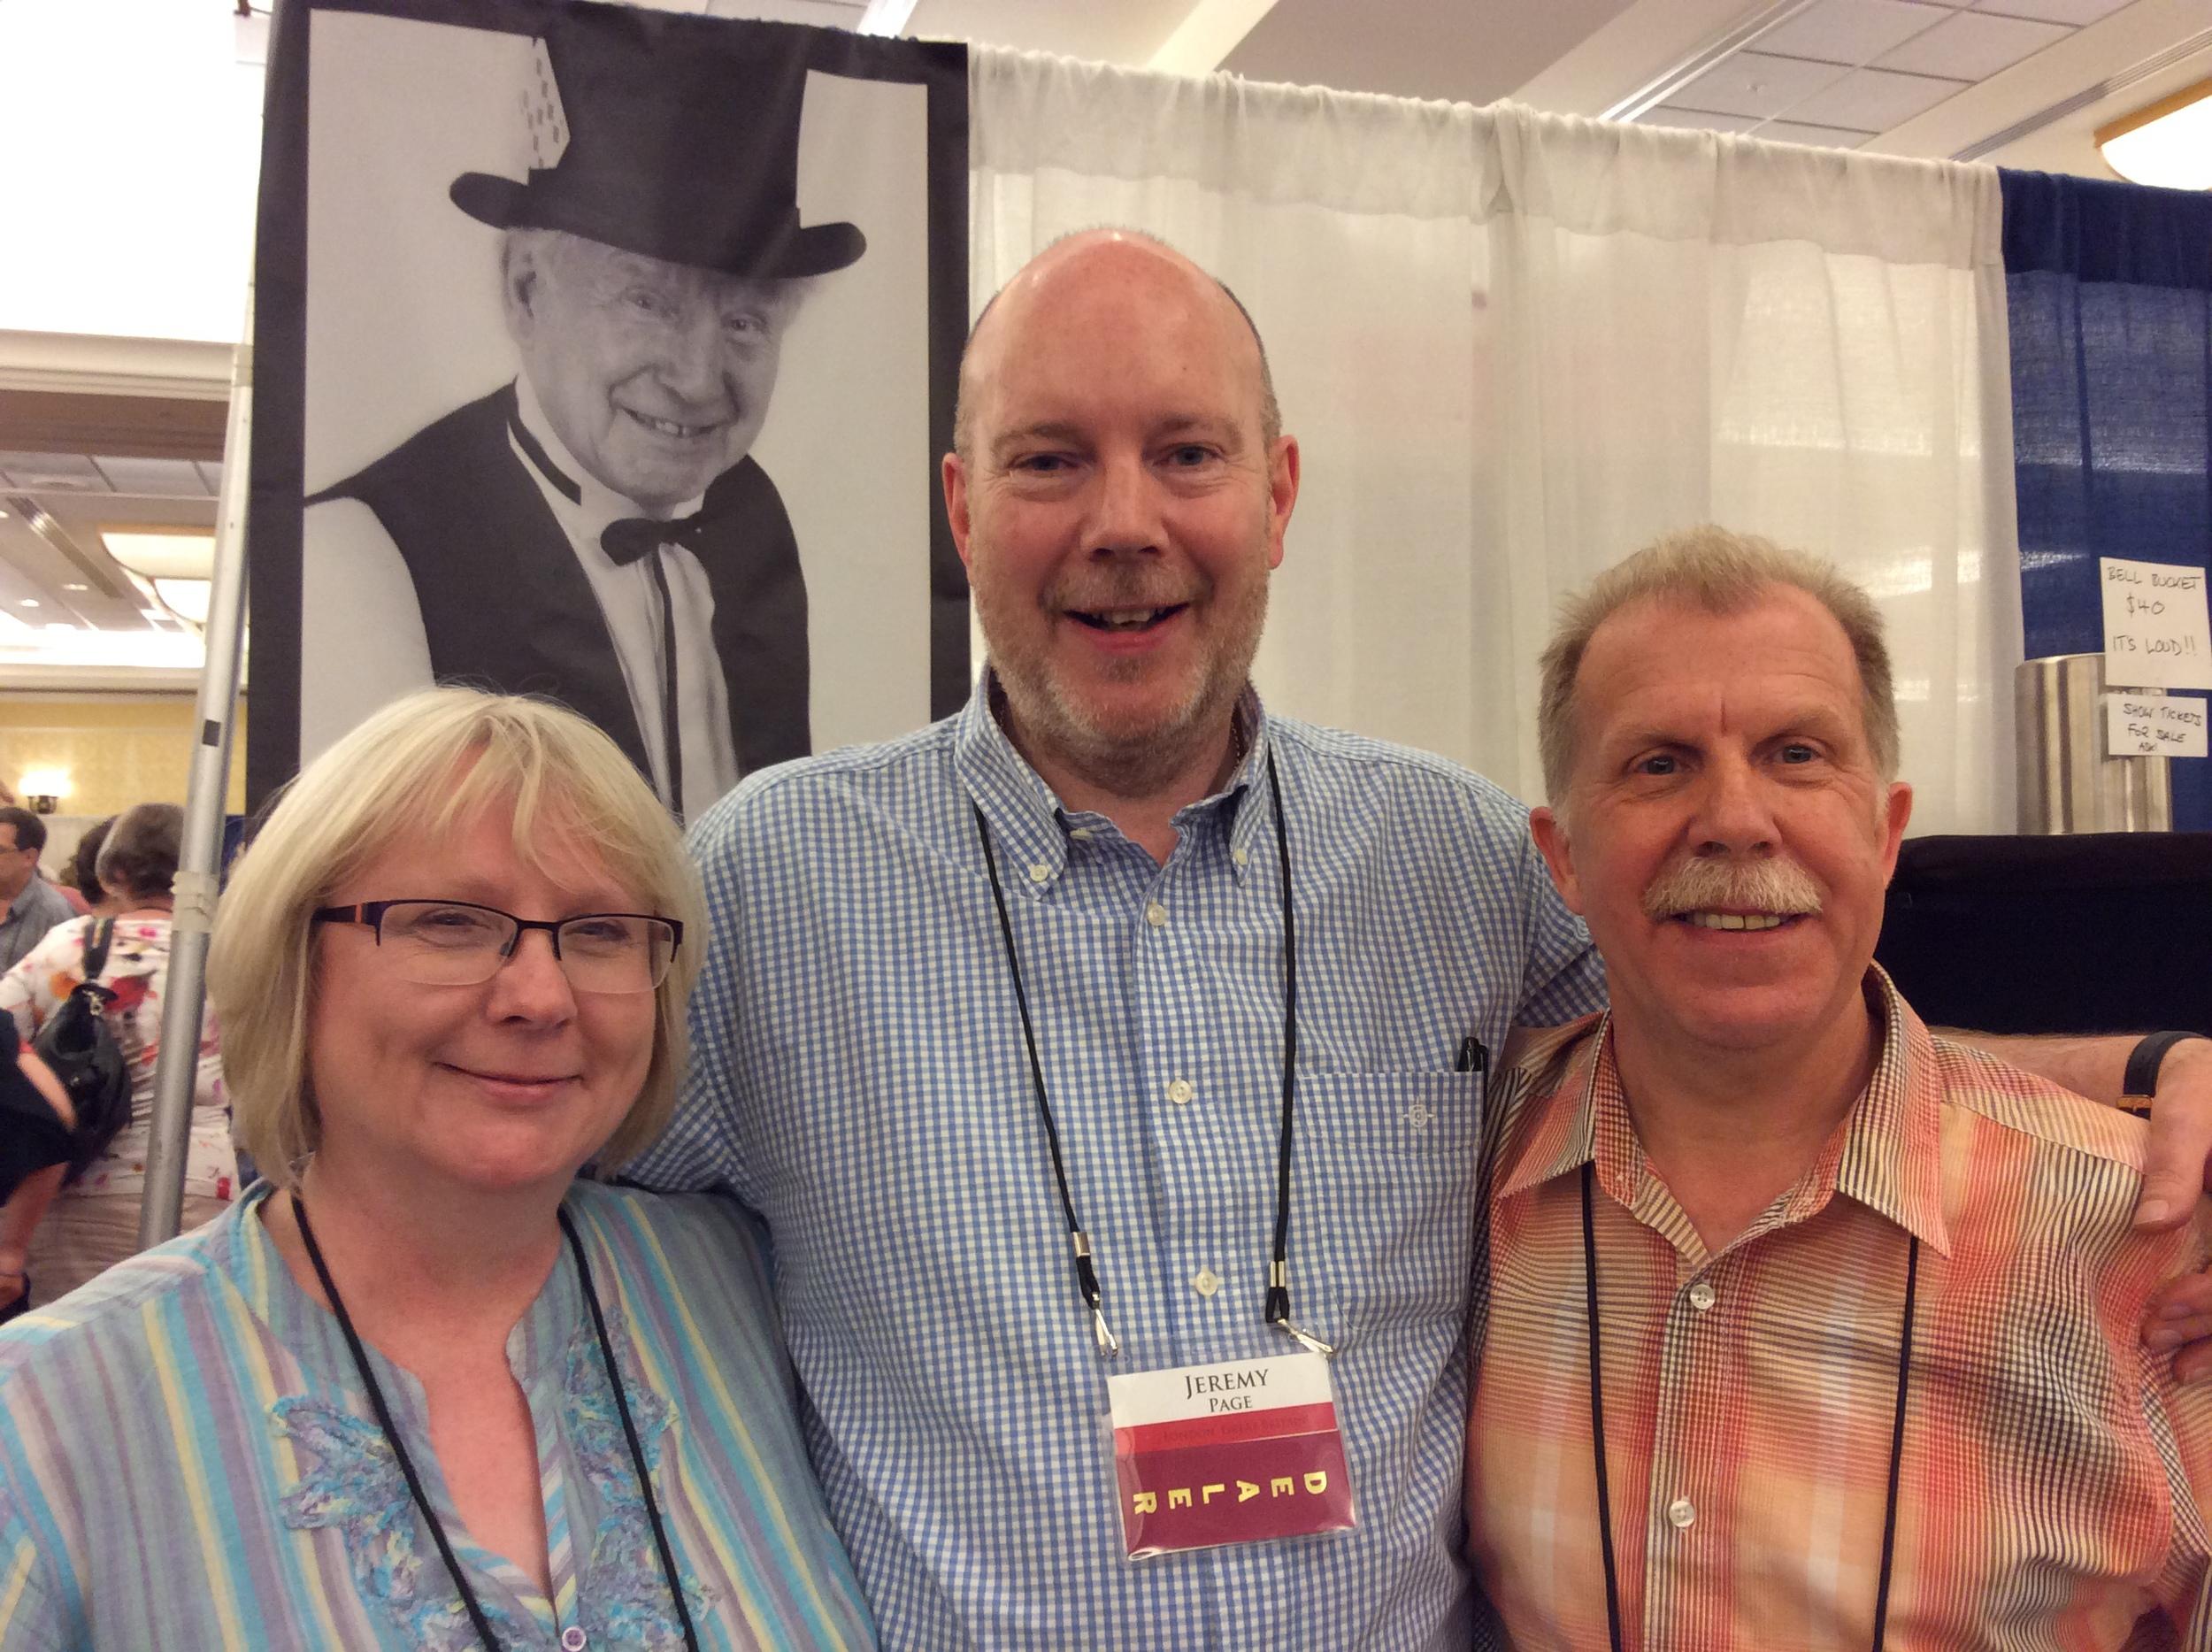 Janette Page, Jeremy Page, & Phillip Pound